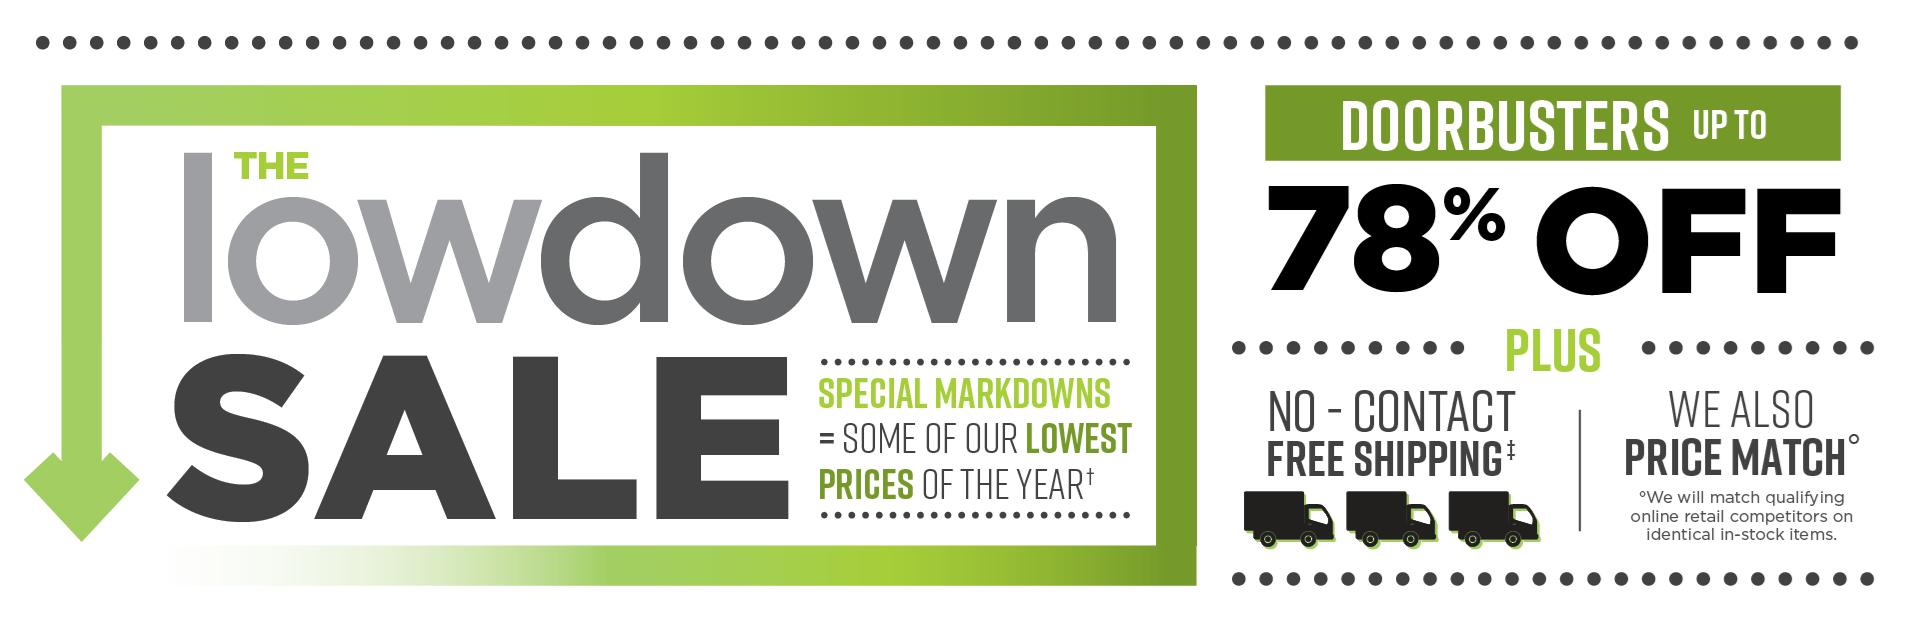 lowdown-sale-2020